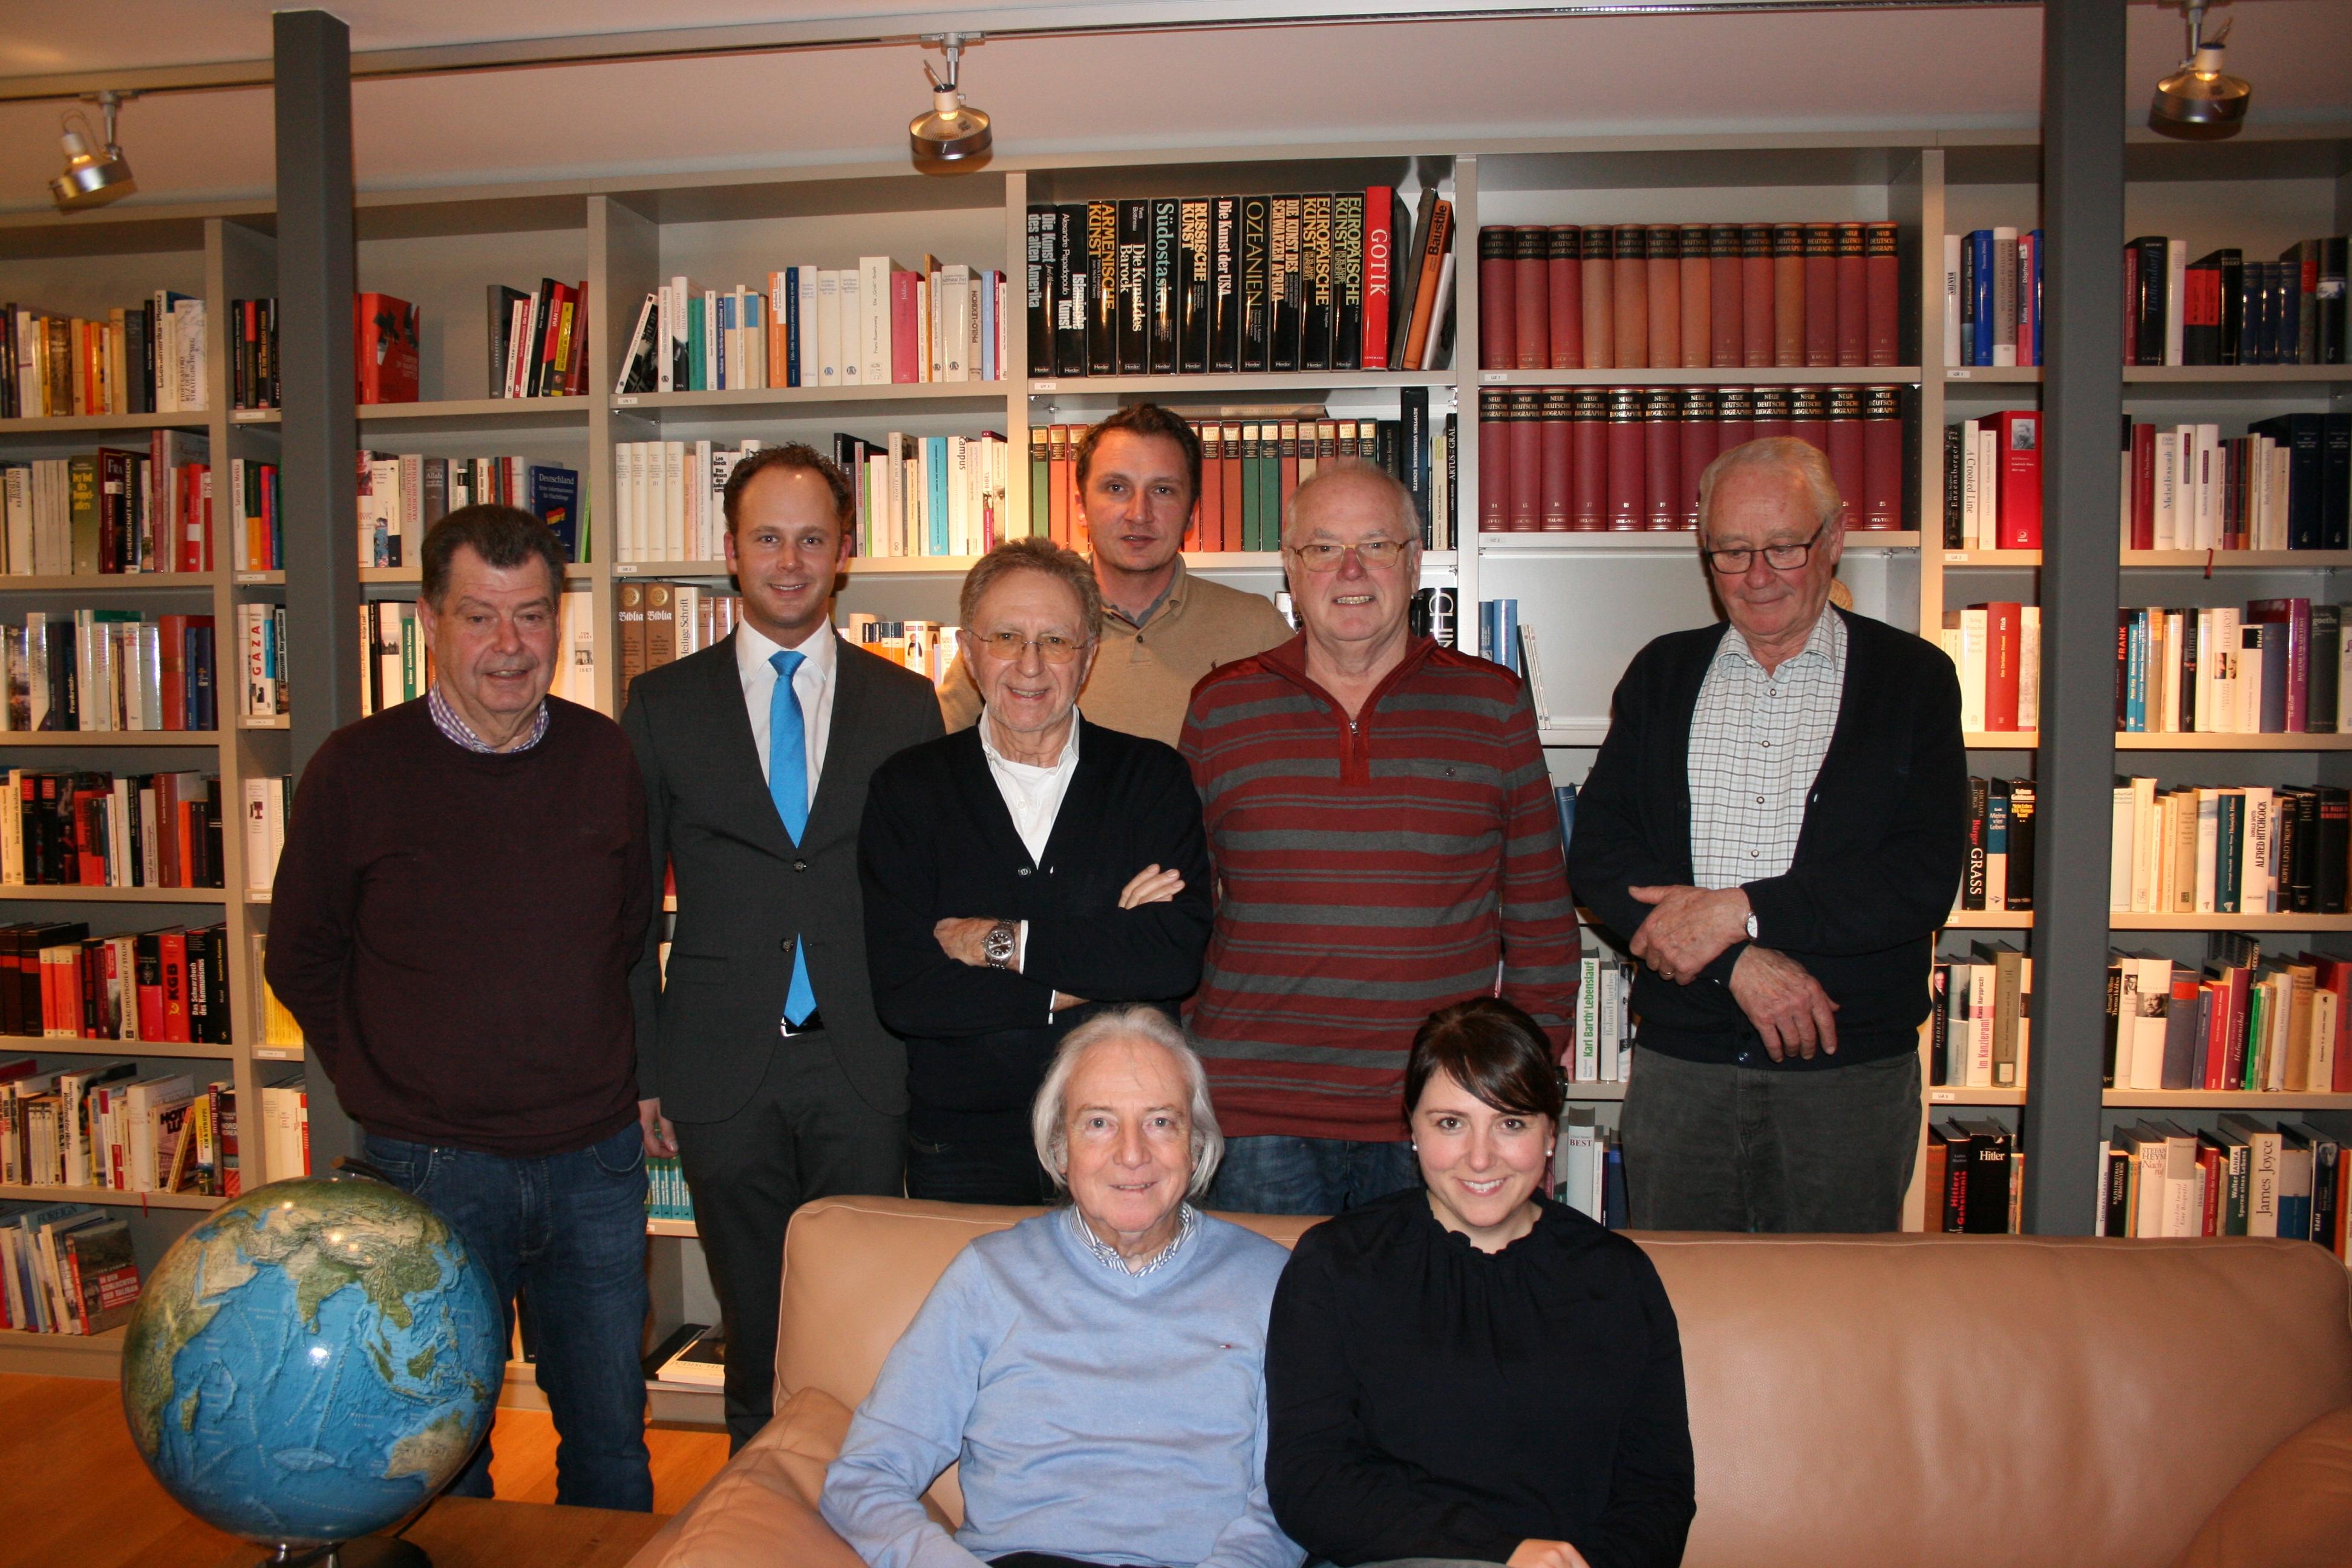 (v.l.n.r.) Rainer Grammann, Kolja Saß, Dr. Peter Büttner, Alexander H. Klüh, Bernd Reekers, Helmut Eigenbrod. Vorne Claus Werckmeister und Sarah Goldbach.